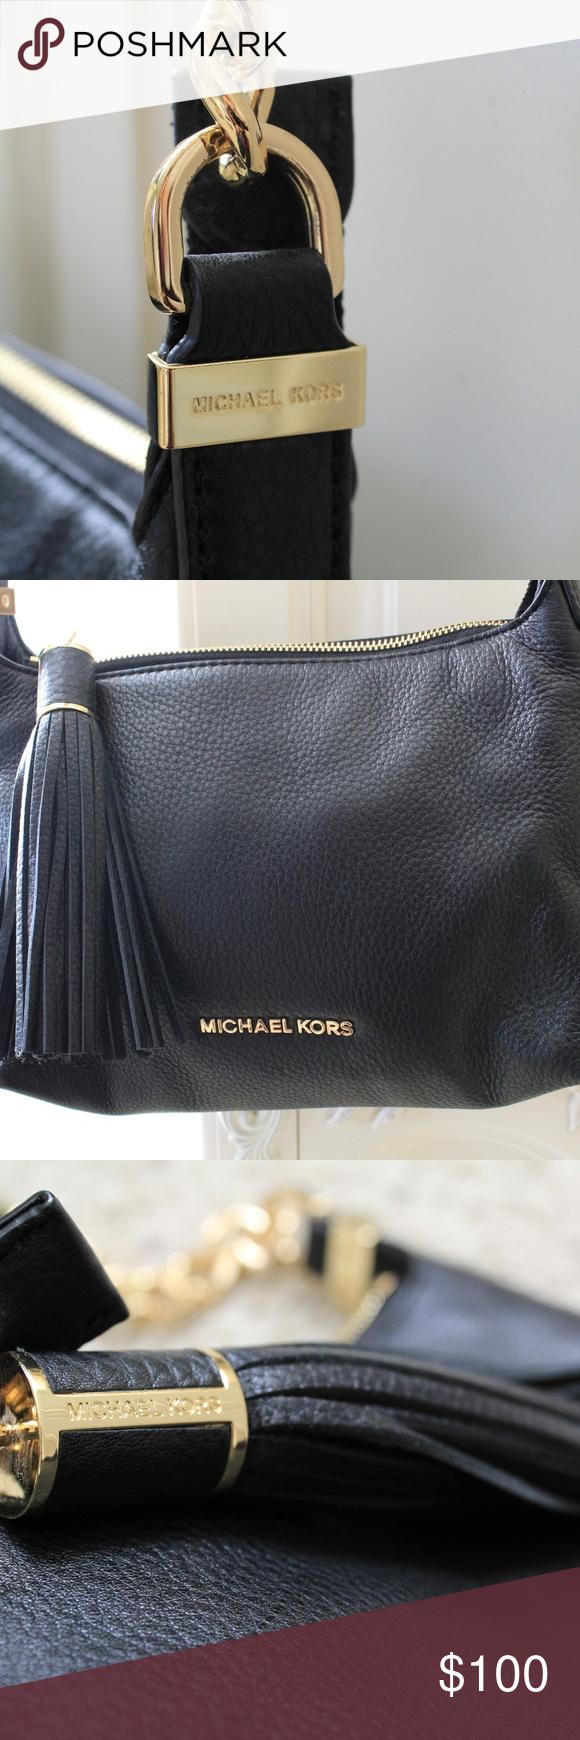 81fa994a5352 Michael Kors Weston Grained Leather Cross-Body Bag Michael Kors grained  leather cross-body